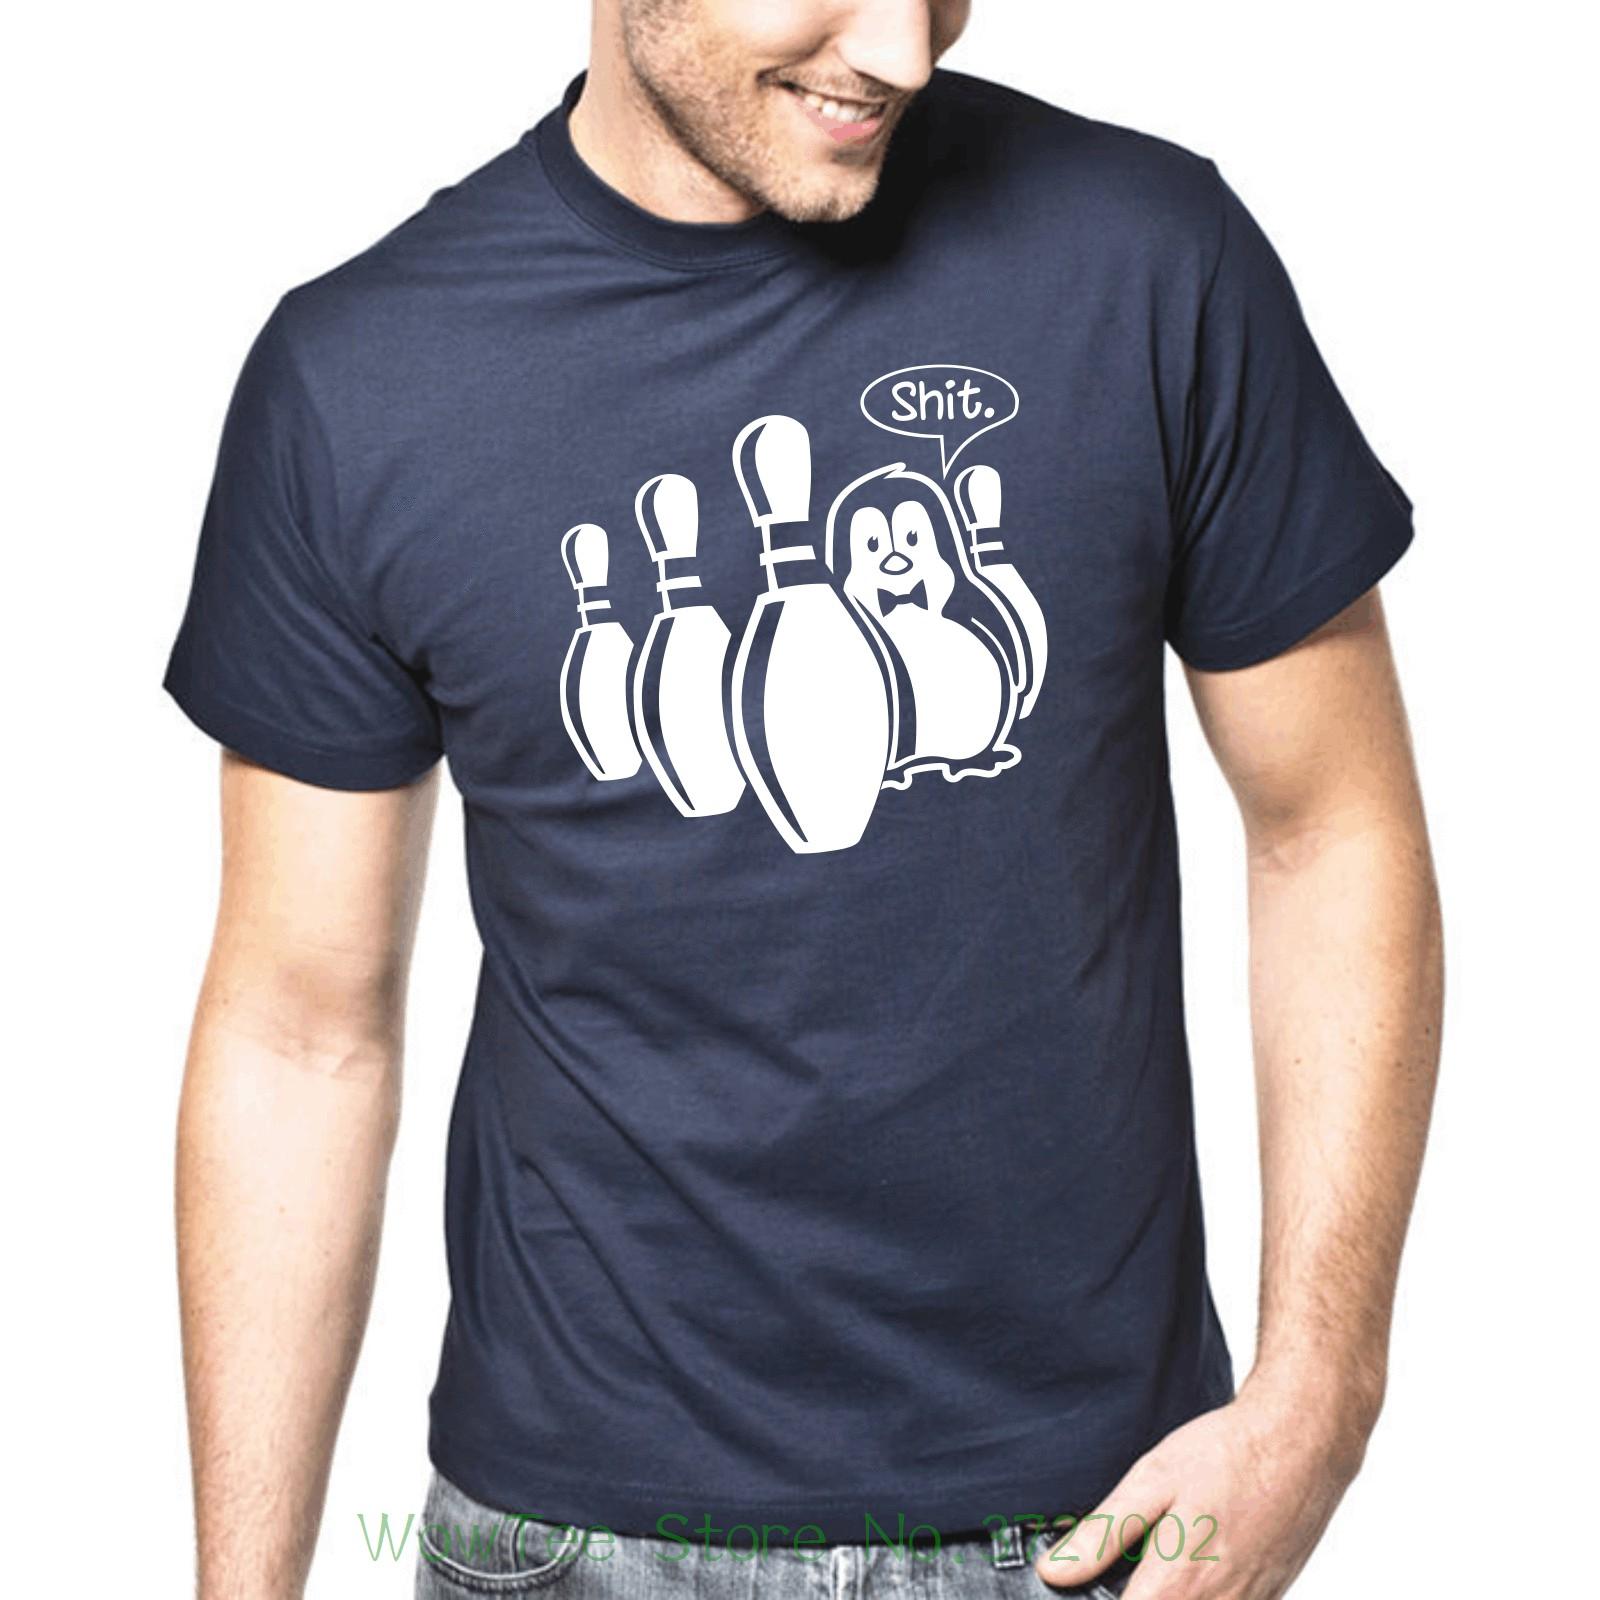 Full Size of Coole T Shirts Sprüche Damen Coole Tshirt Sprüche Zum 18. Geburtstag Coole Sprüche Für Auf T Shirt Coole Tshirt Sprüche Für Kinder Küche Coole T Shirt Sprüche